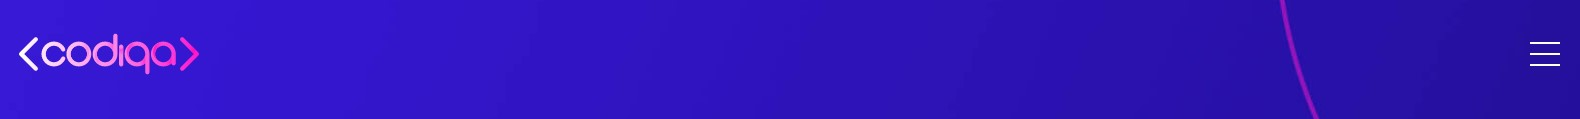 https://documentation.bold-themes.com/codiqa/wp-content/uploads/sites/49/2019/10/hide-menu.jpg